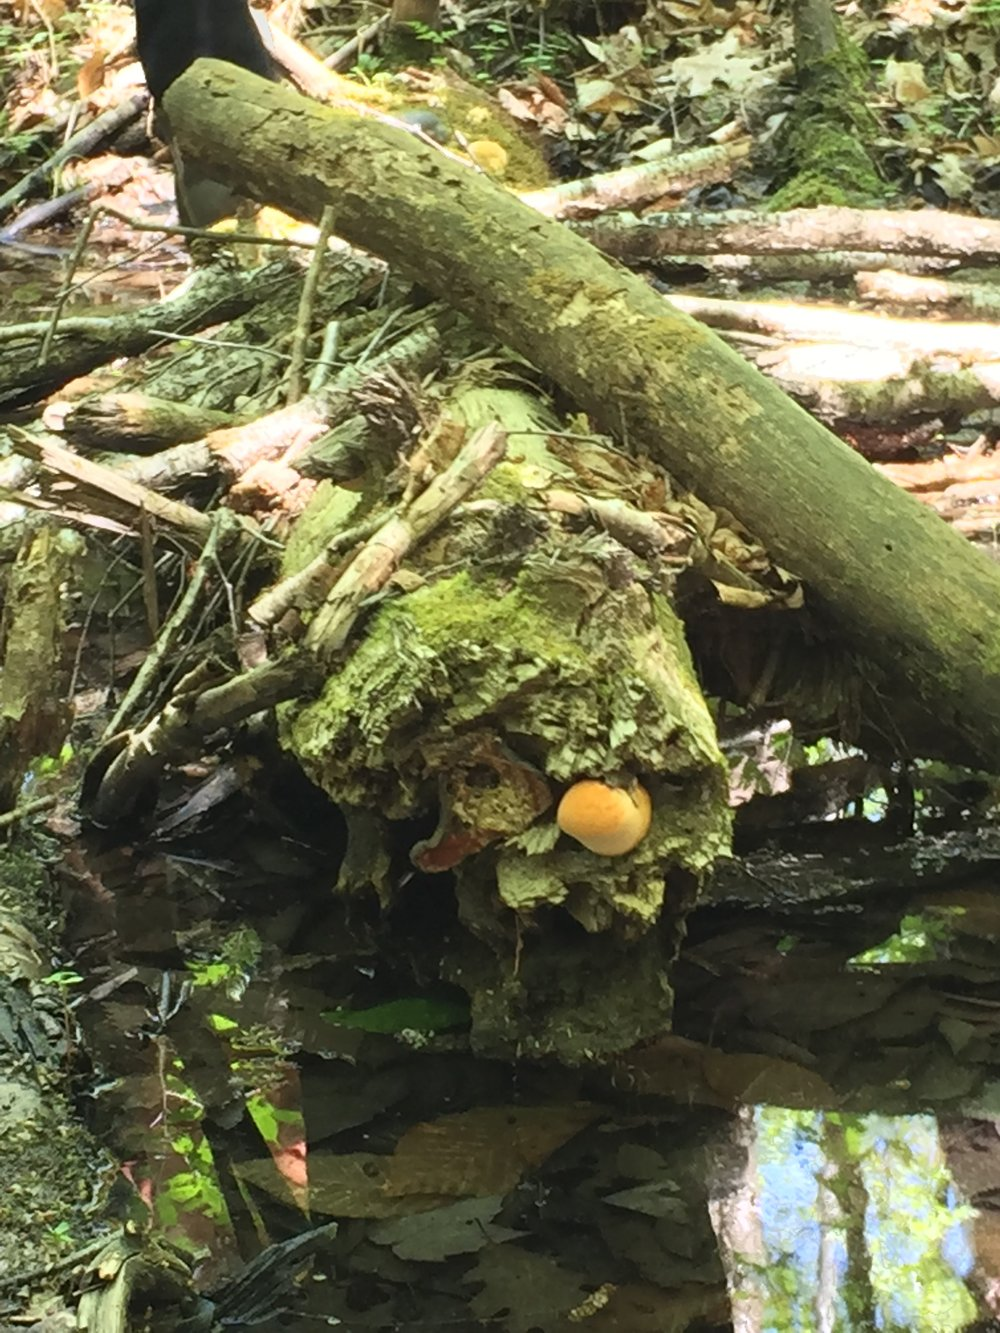 Reshi mushroom on dead Hemlock